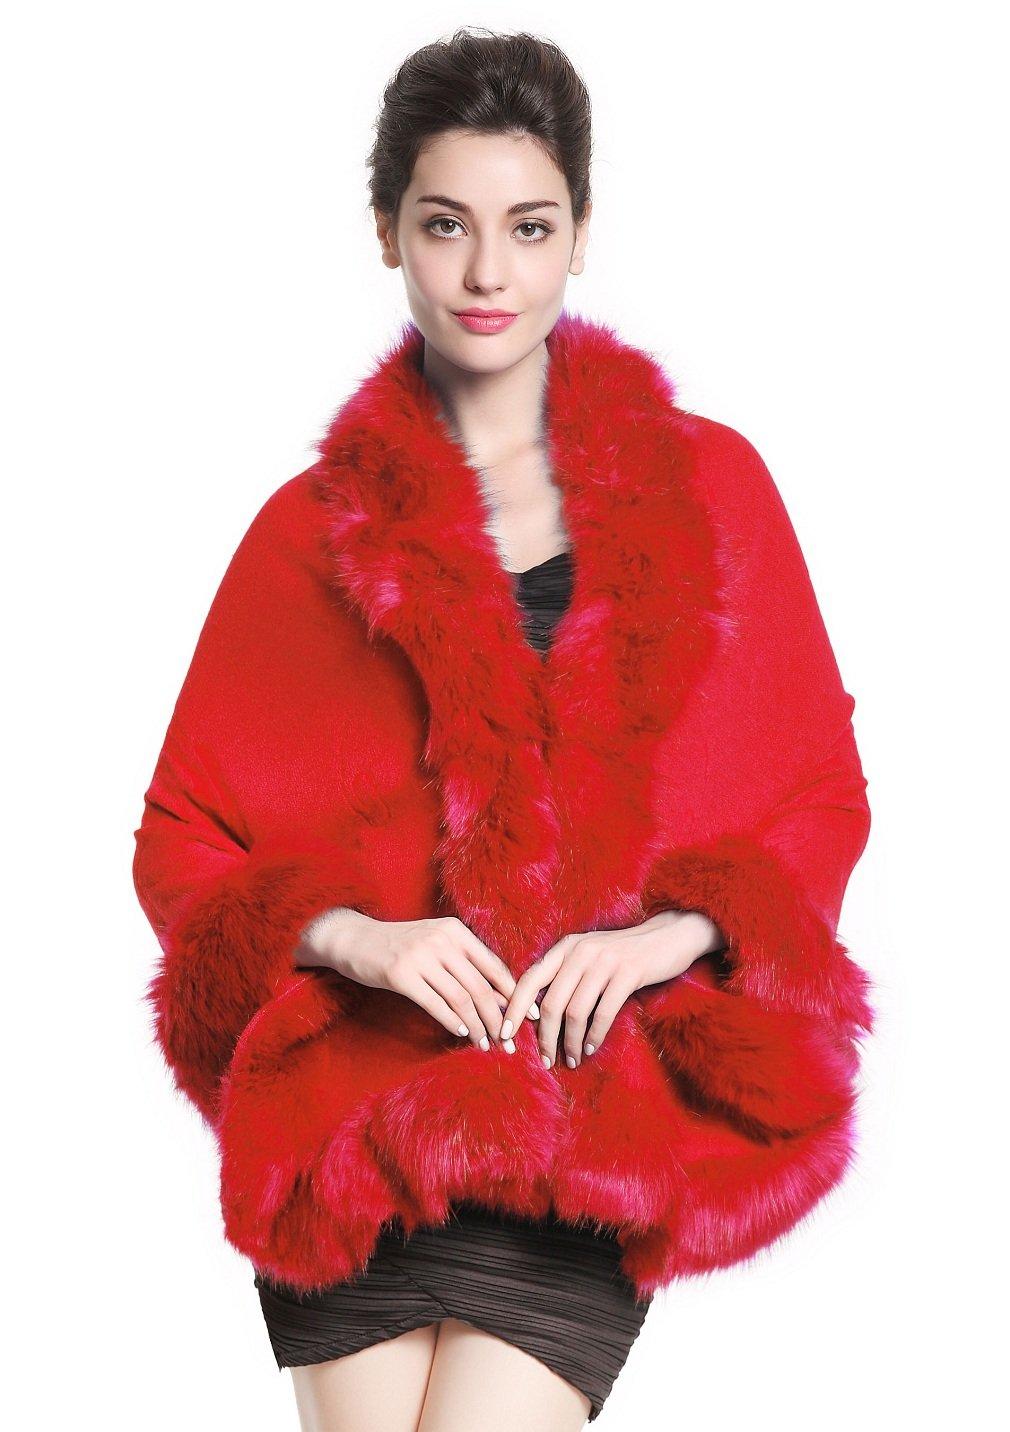 Faux Fur Shawl Wrap Stole Shrug Bridal Winter Wedding with Hook Red